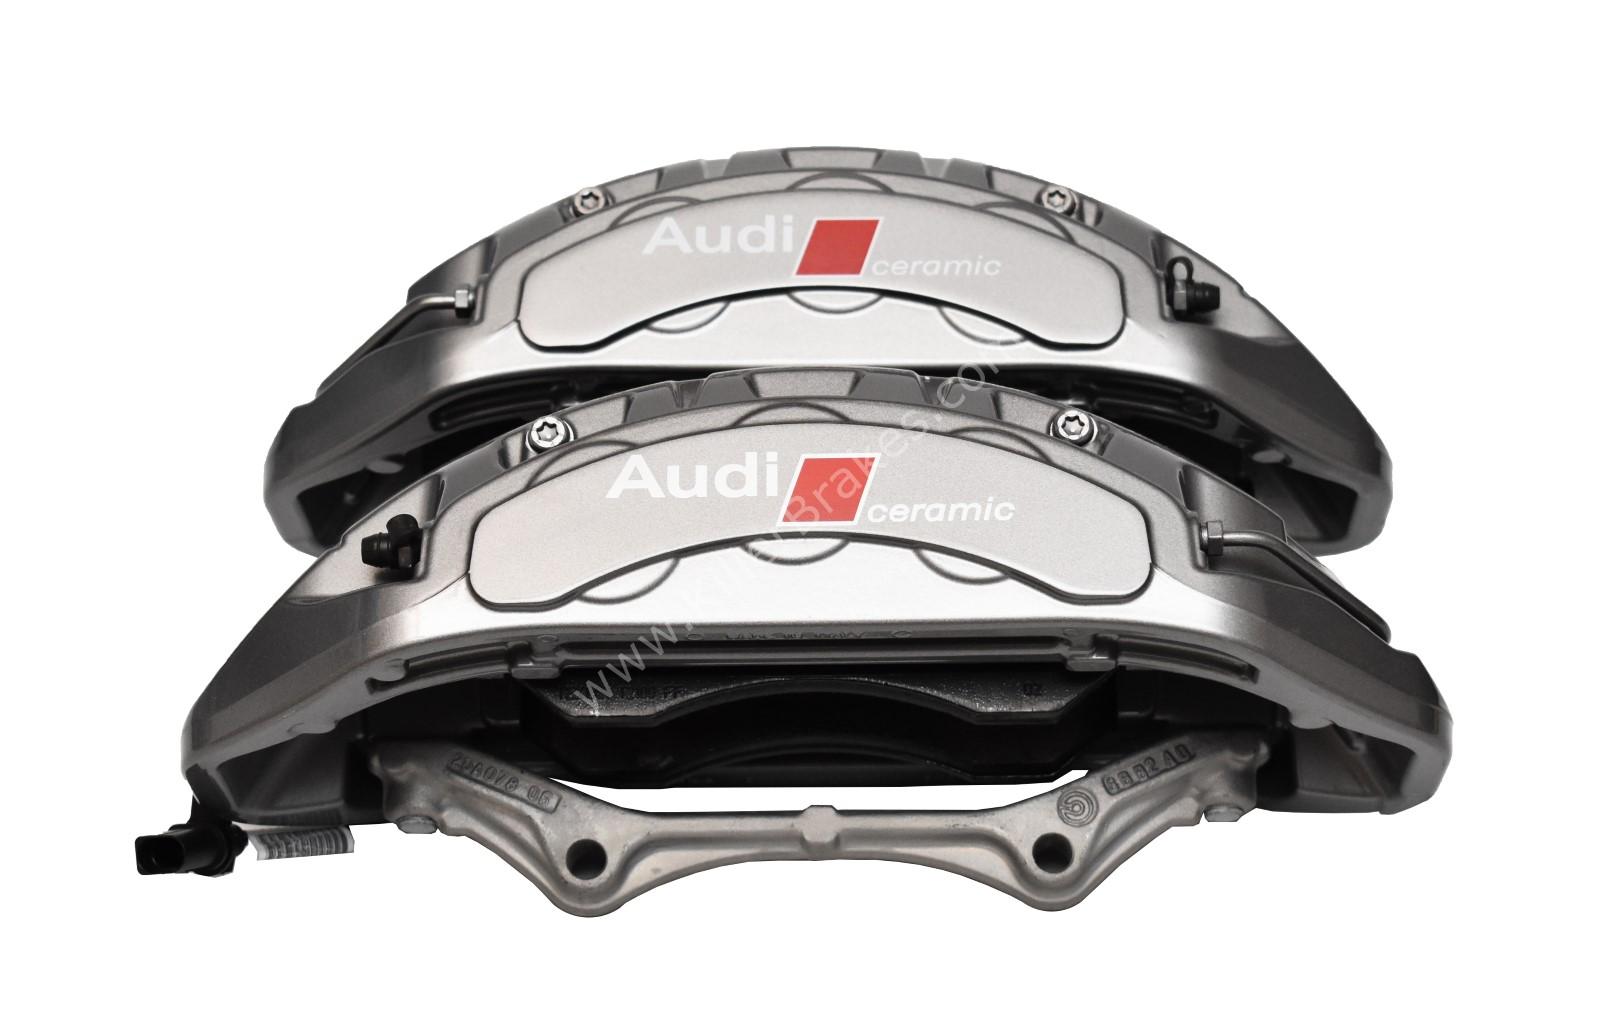 Audi Rs4 RS5 B9 Front Carbon Ceramic Brake Calipers 8W0615107K 8W0615108K NEW